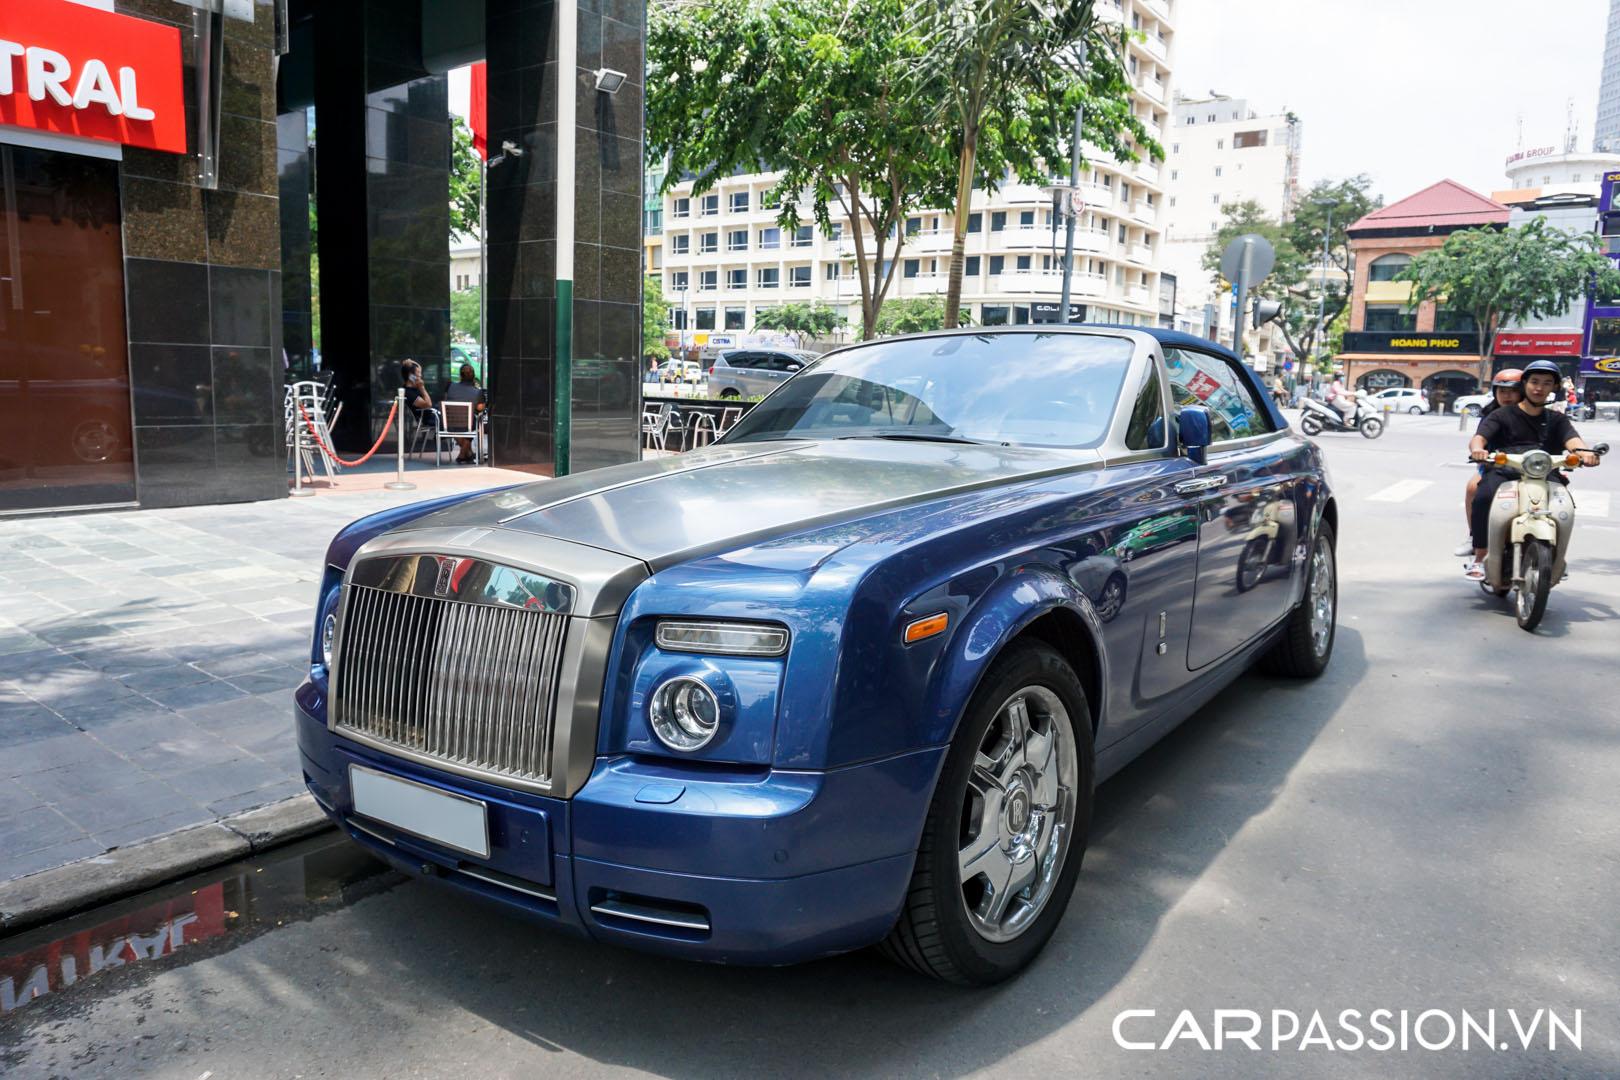 CP-Rolls-Royce Phantom Drophead Coupe xanh (2).jpg